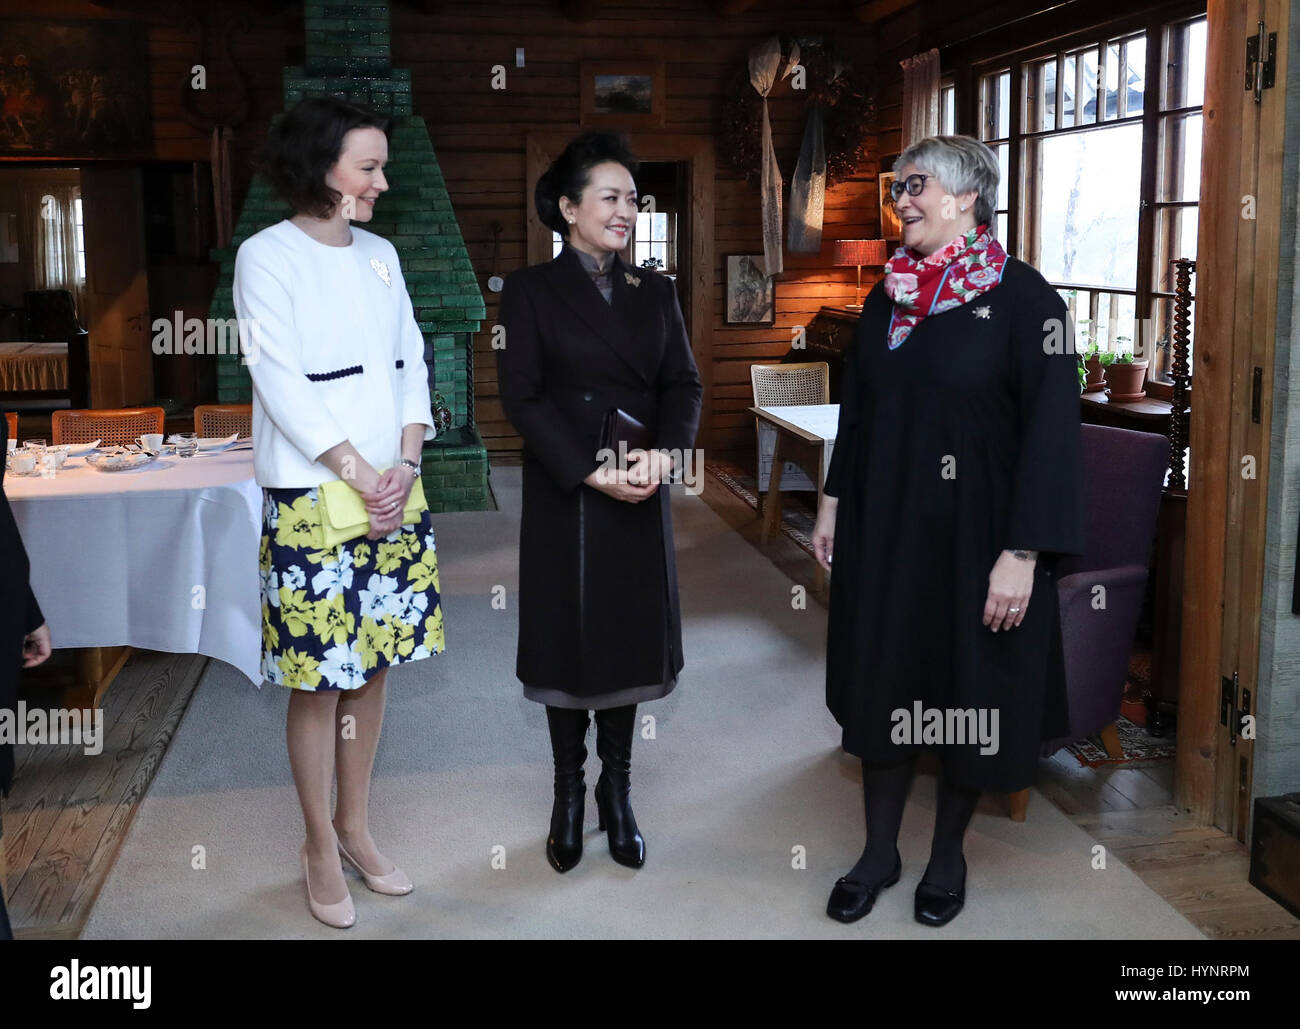 Helsinki, Finland. 5th Apr, 2017. Peng Liyuan (C), wife of Chinese President Xi Jinping, visits Ainola, the former Stock Photo